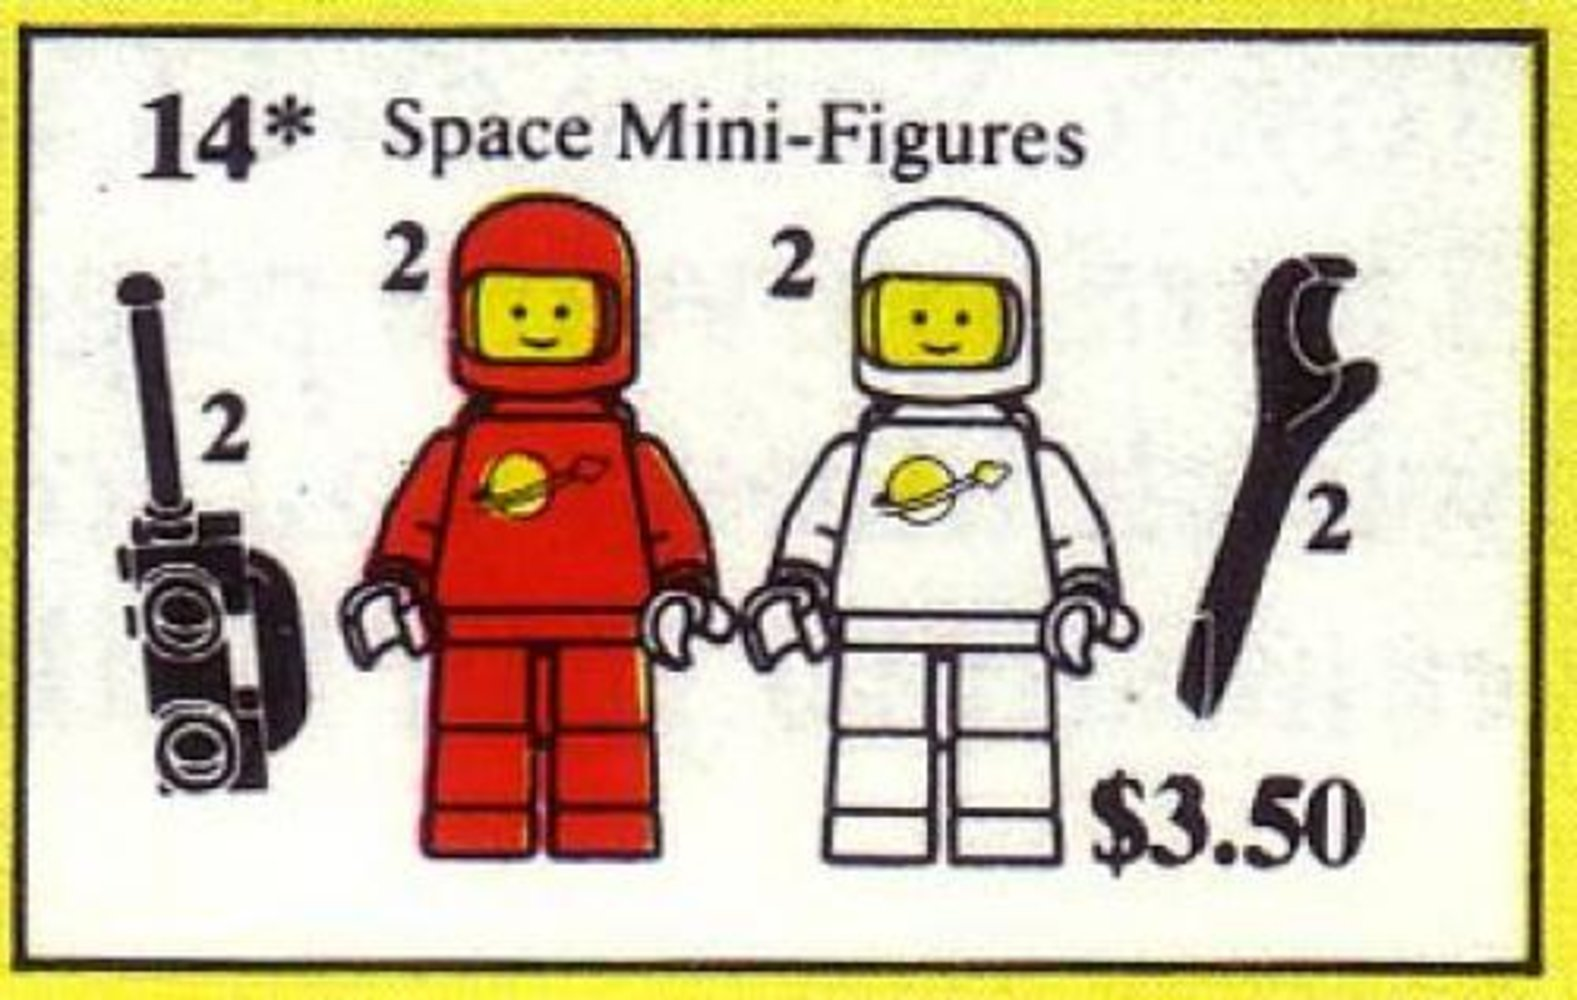 Space Mini Figures